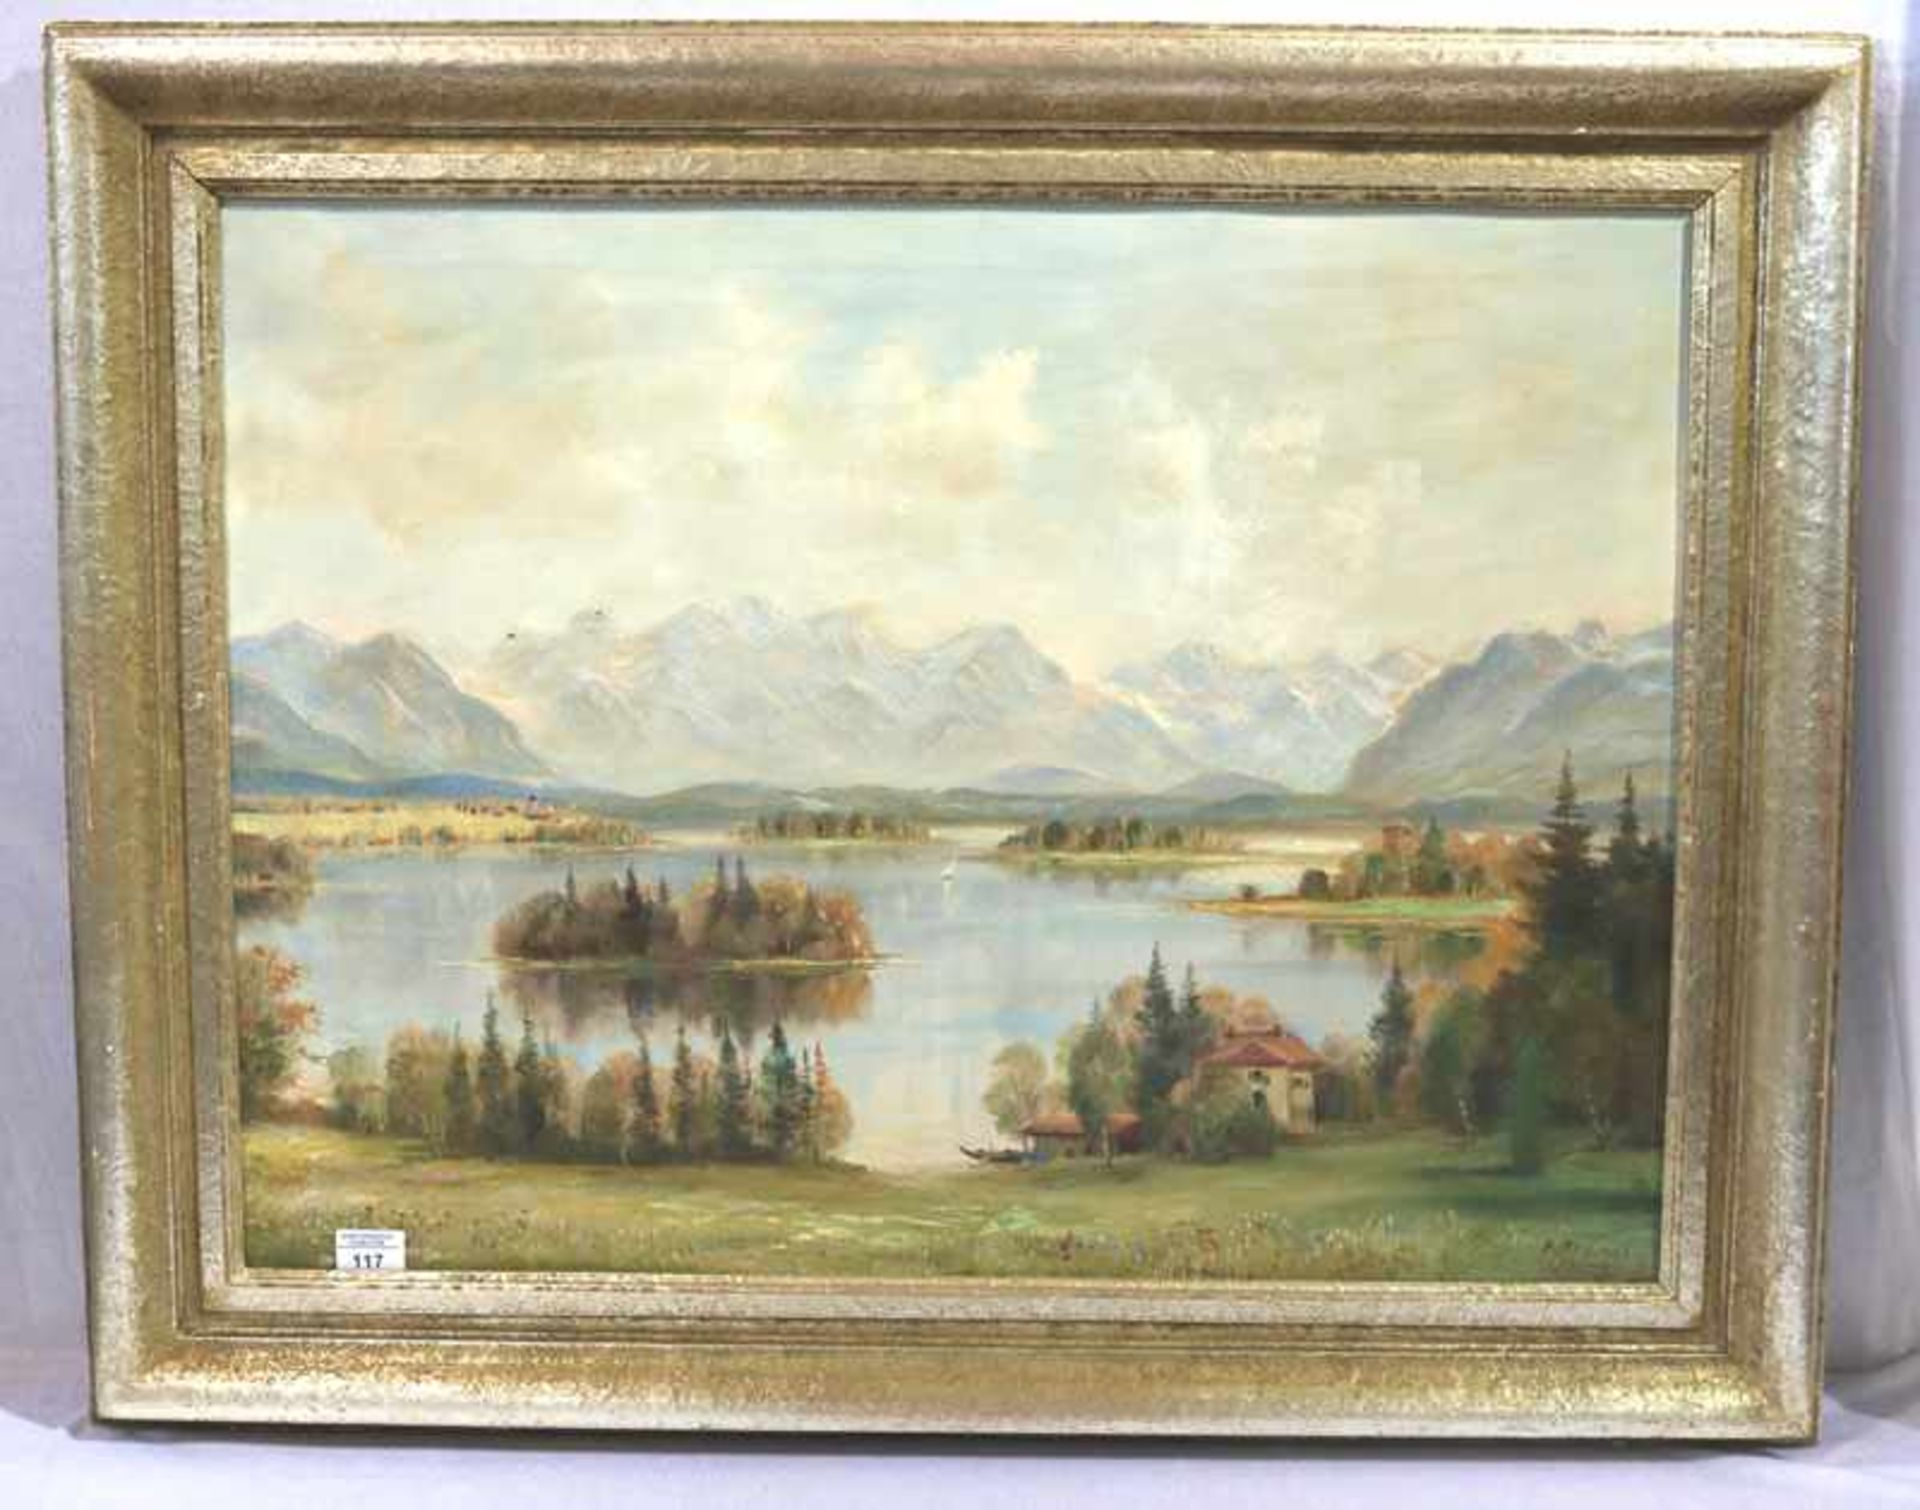 Los 117 - Gemälde ÖL/LW 'Staffelsee vor Gebirgs-Szenerie', signiert J. Brandl, Uffing, benötigt Reinigung,